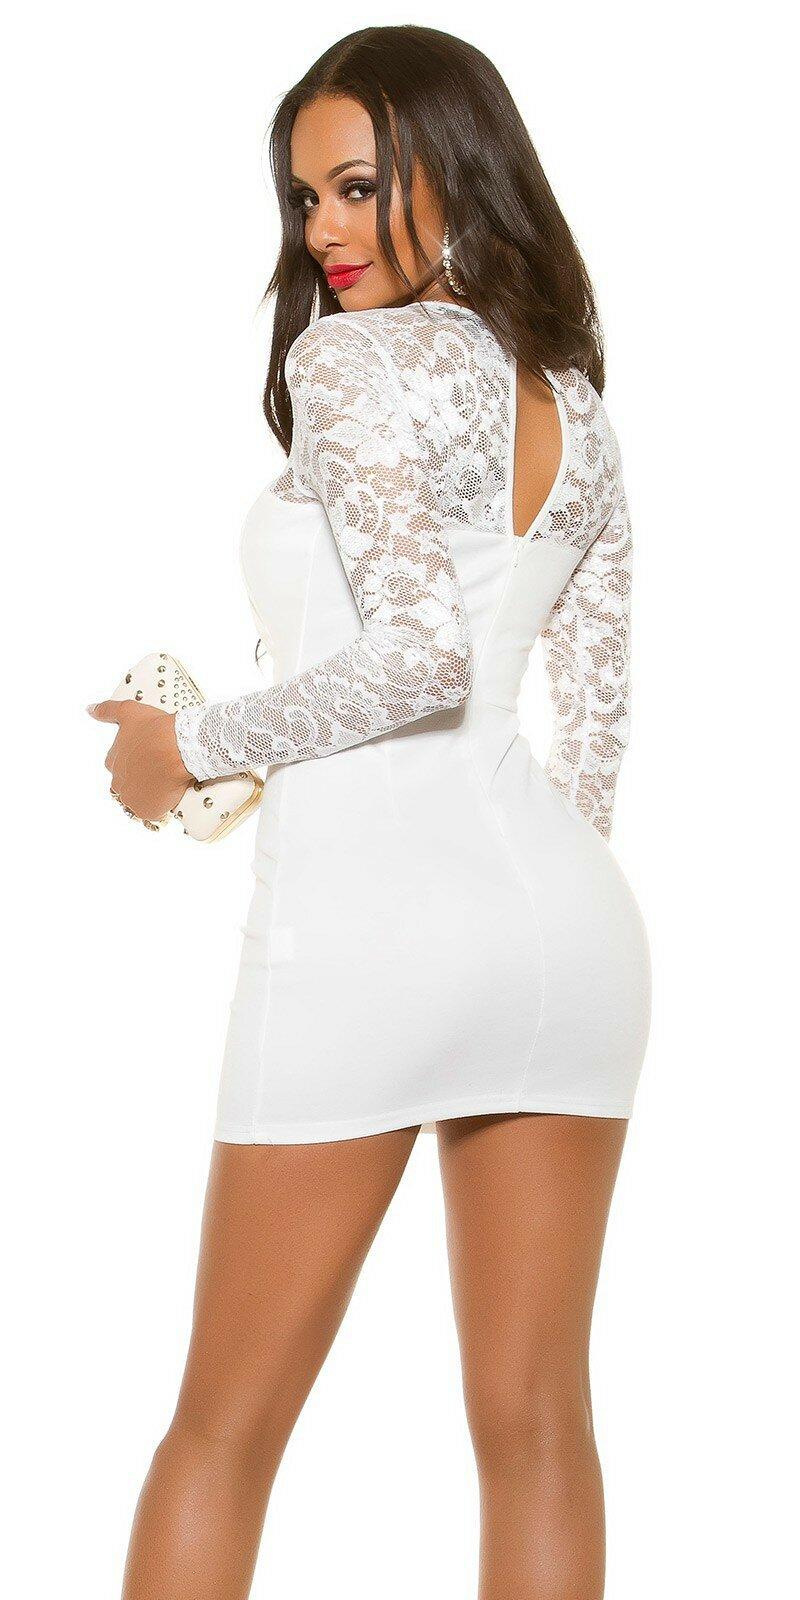 c4a5897b0209 Mini šaty s dlhými rukávmi KouCla - NajlepsiaModa.sk